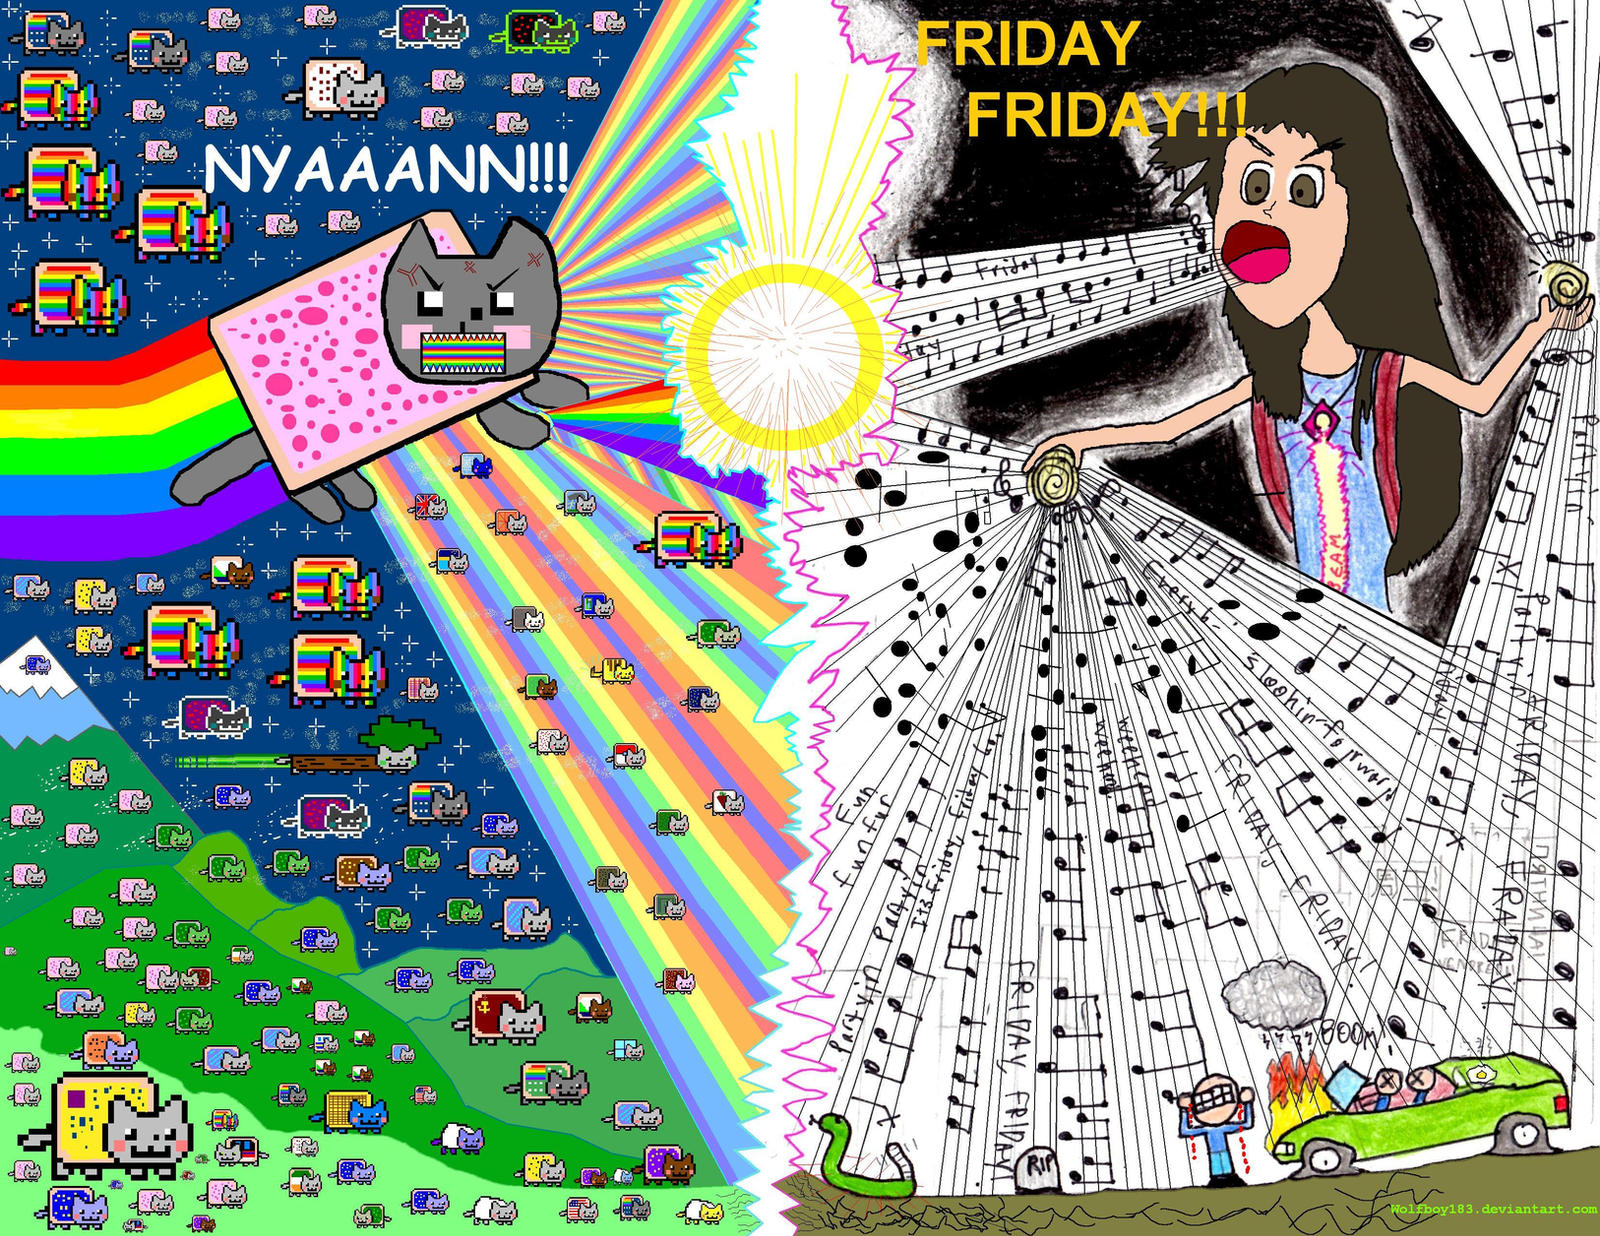 Nyan Cat Vs Rebecca Black by Wolfboy183